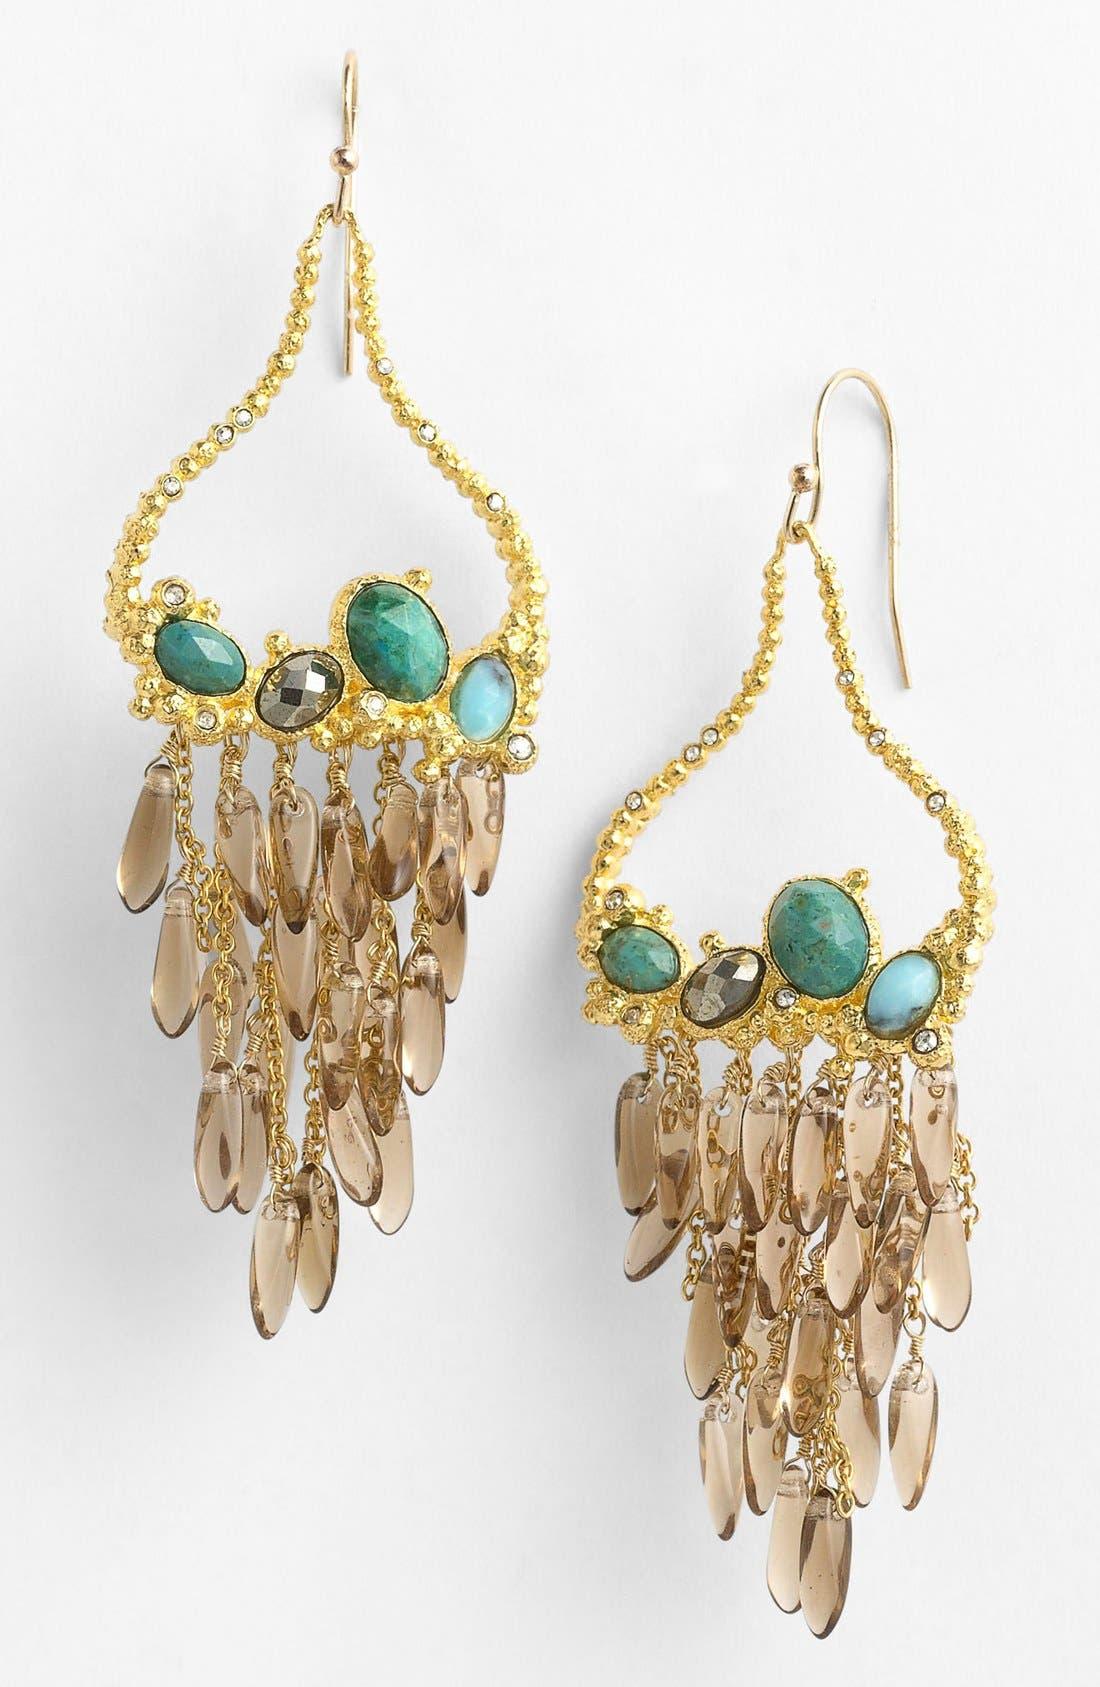 Main Image - Alexis Bittar 'Elements - Cordova' Chandelier Earrings